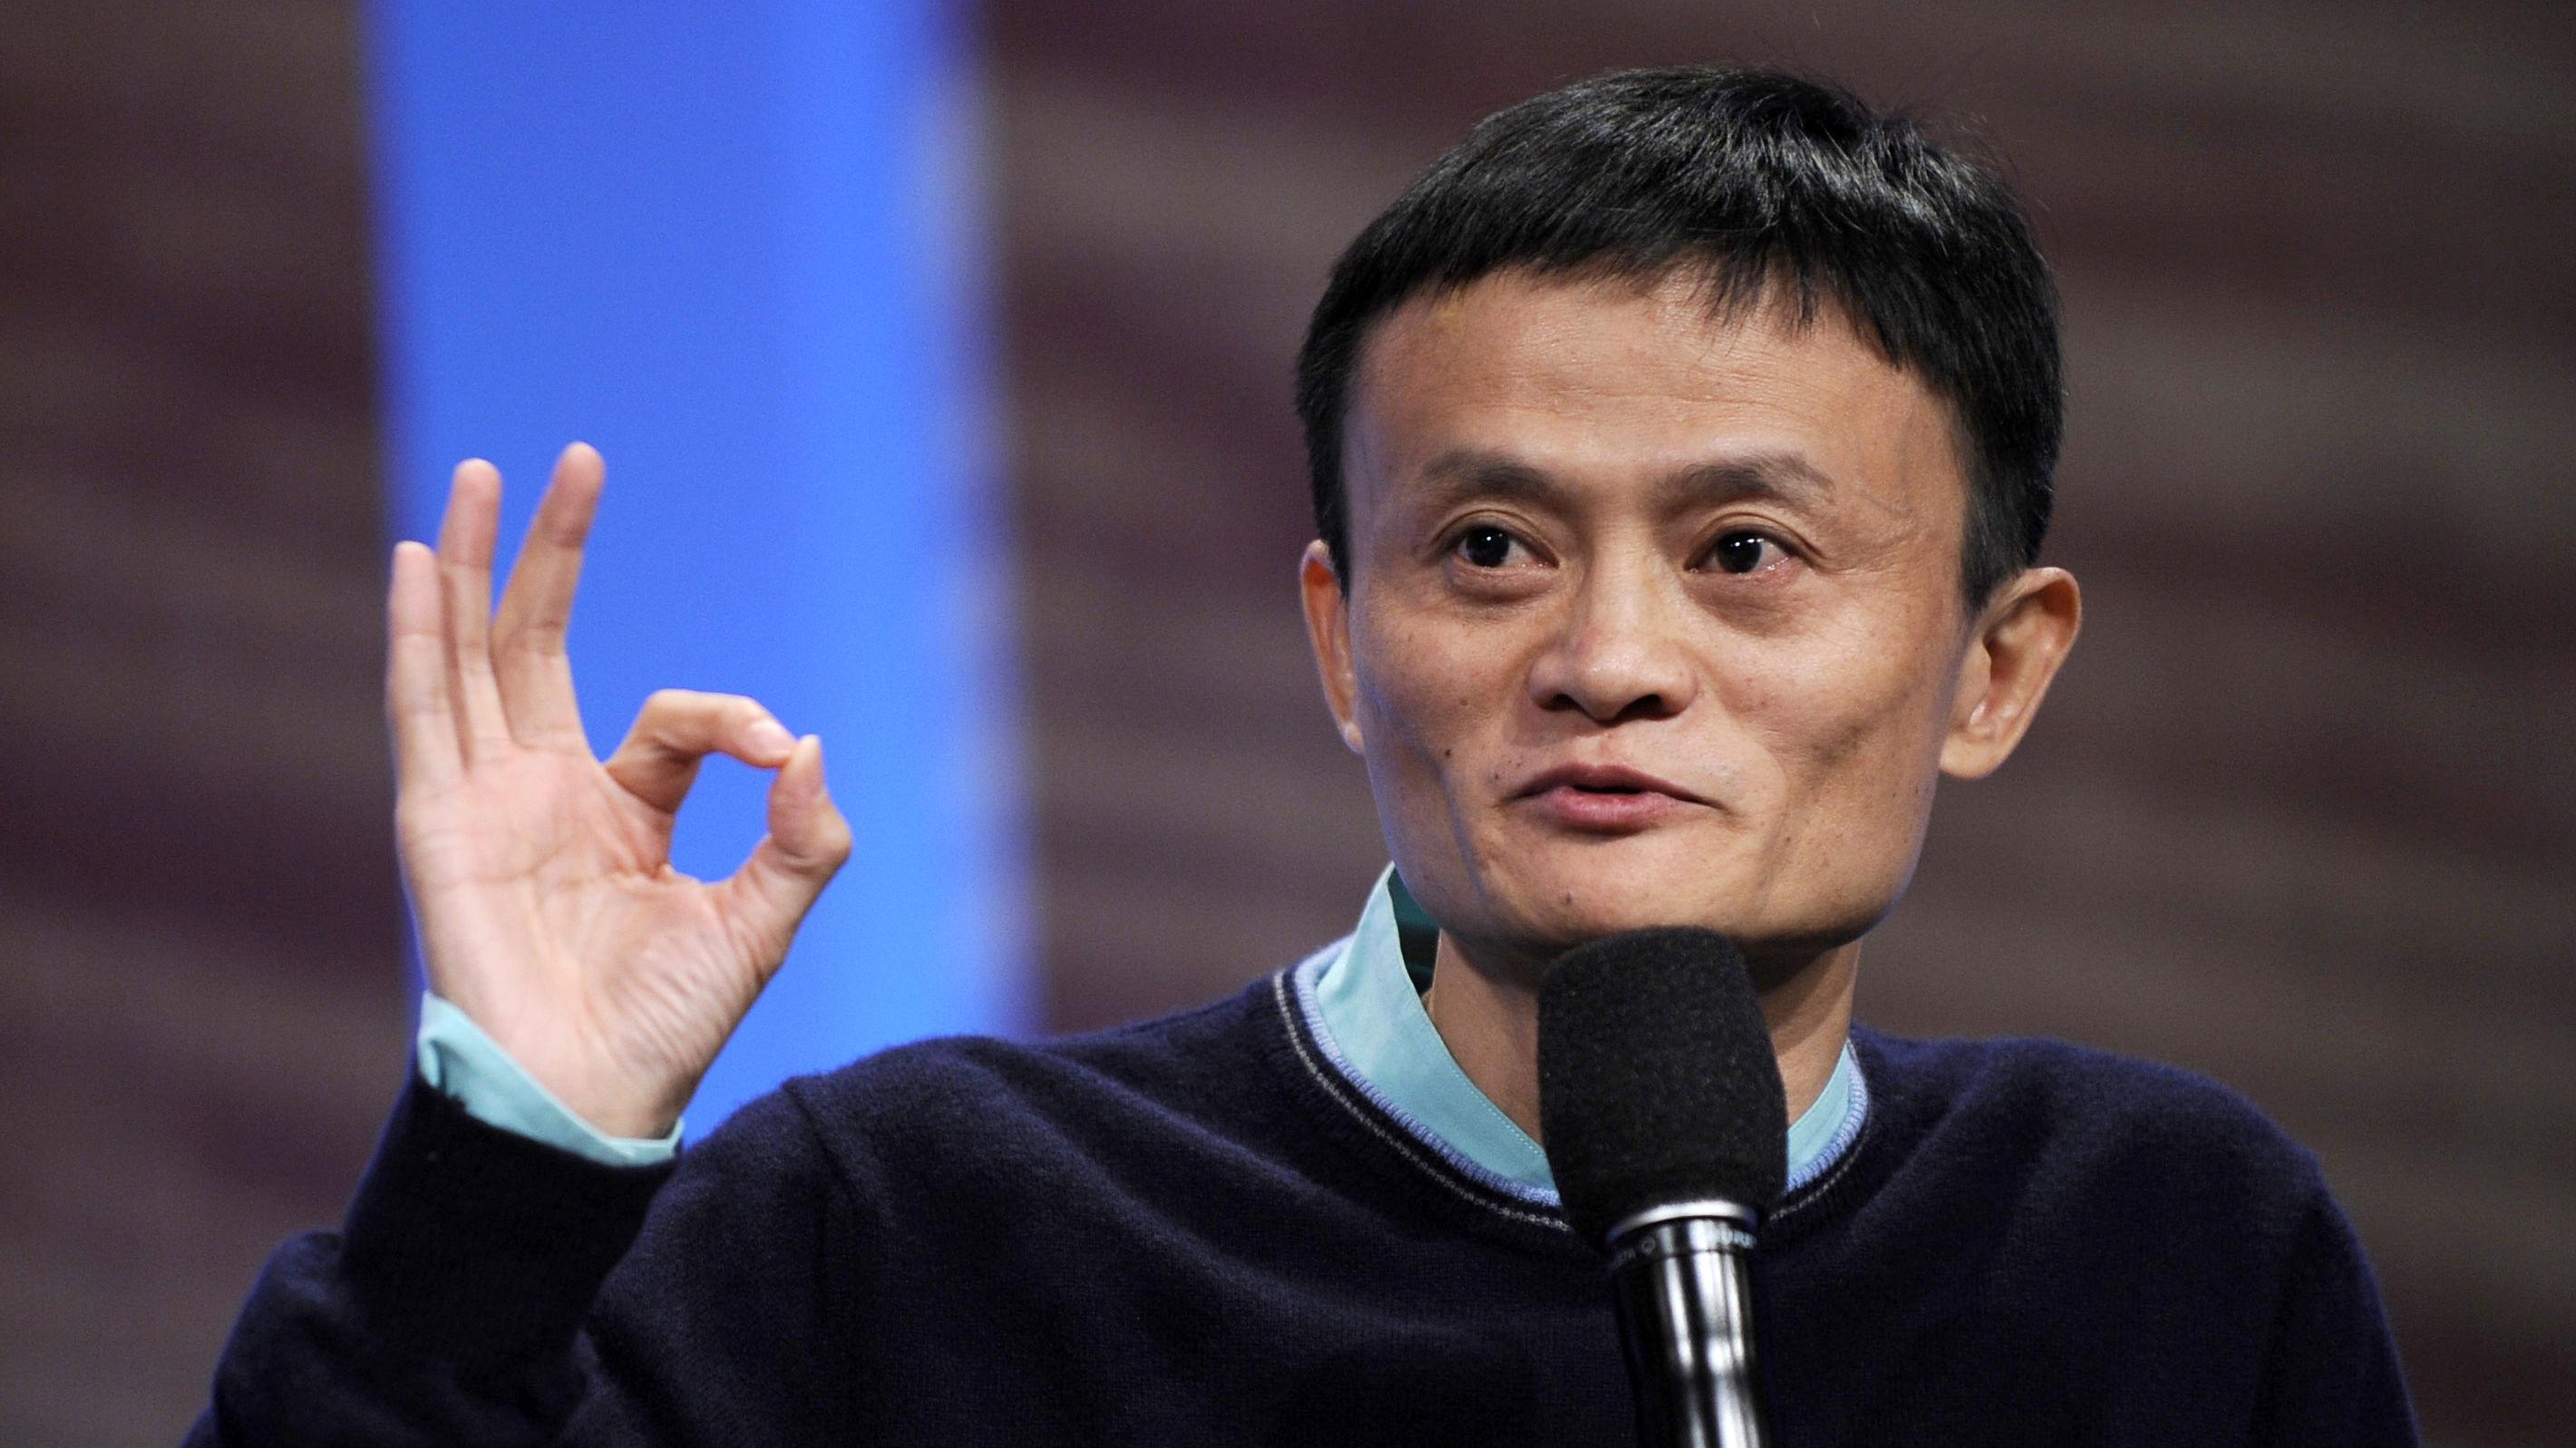 Jack Ma, Alibaba's CEO